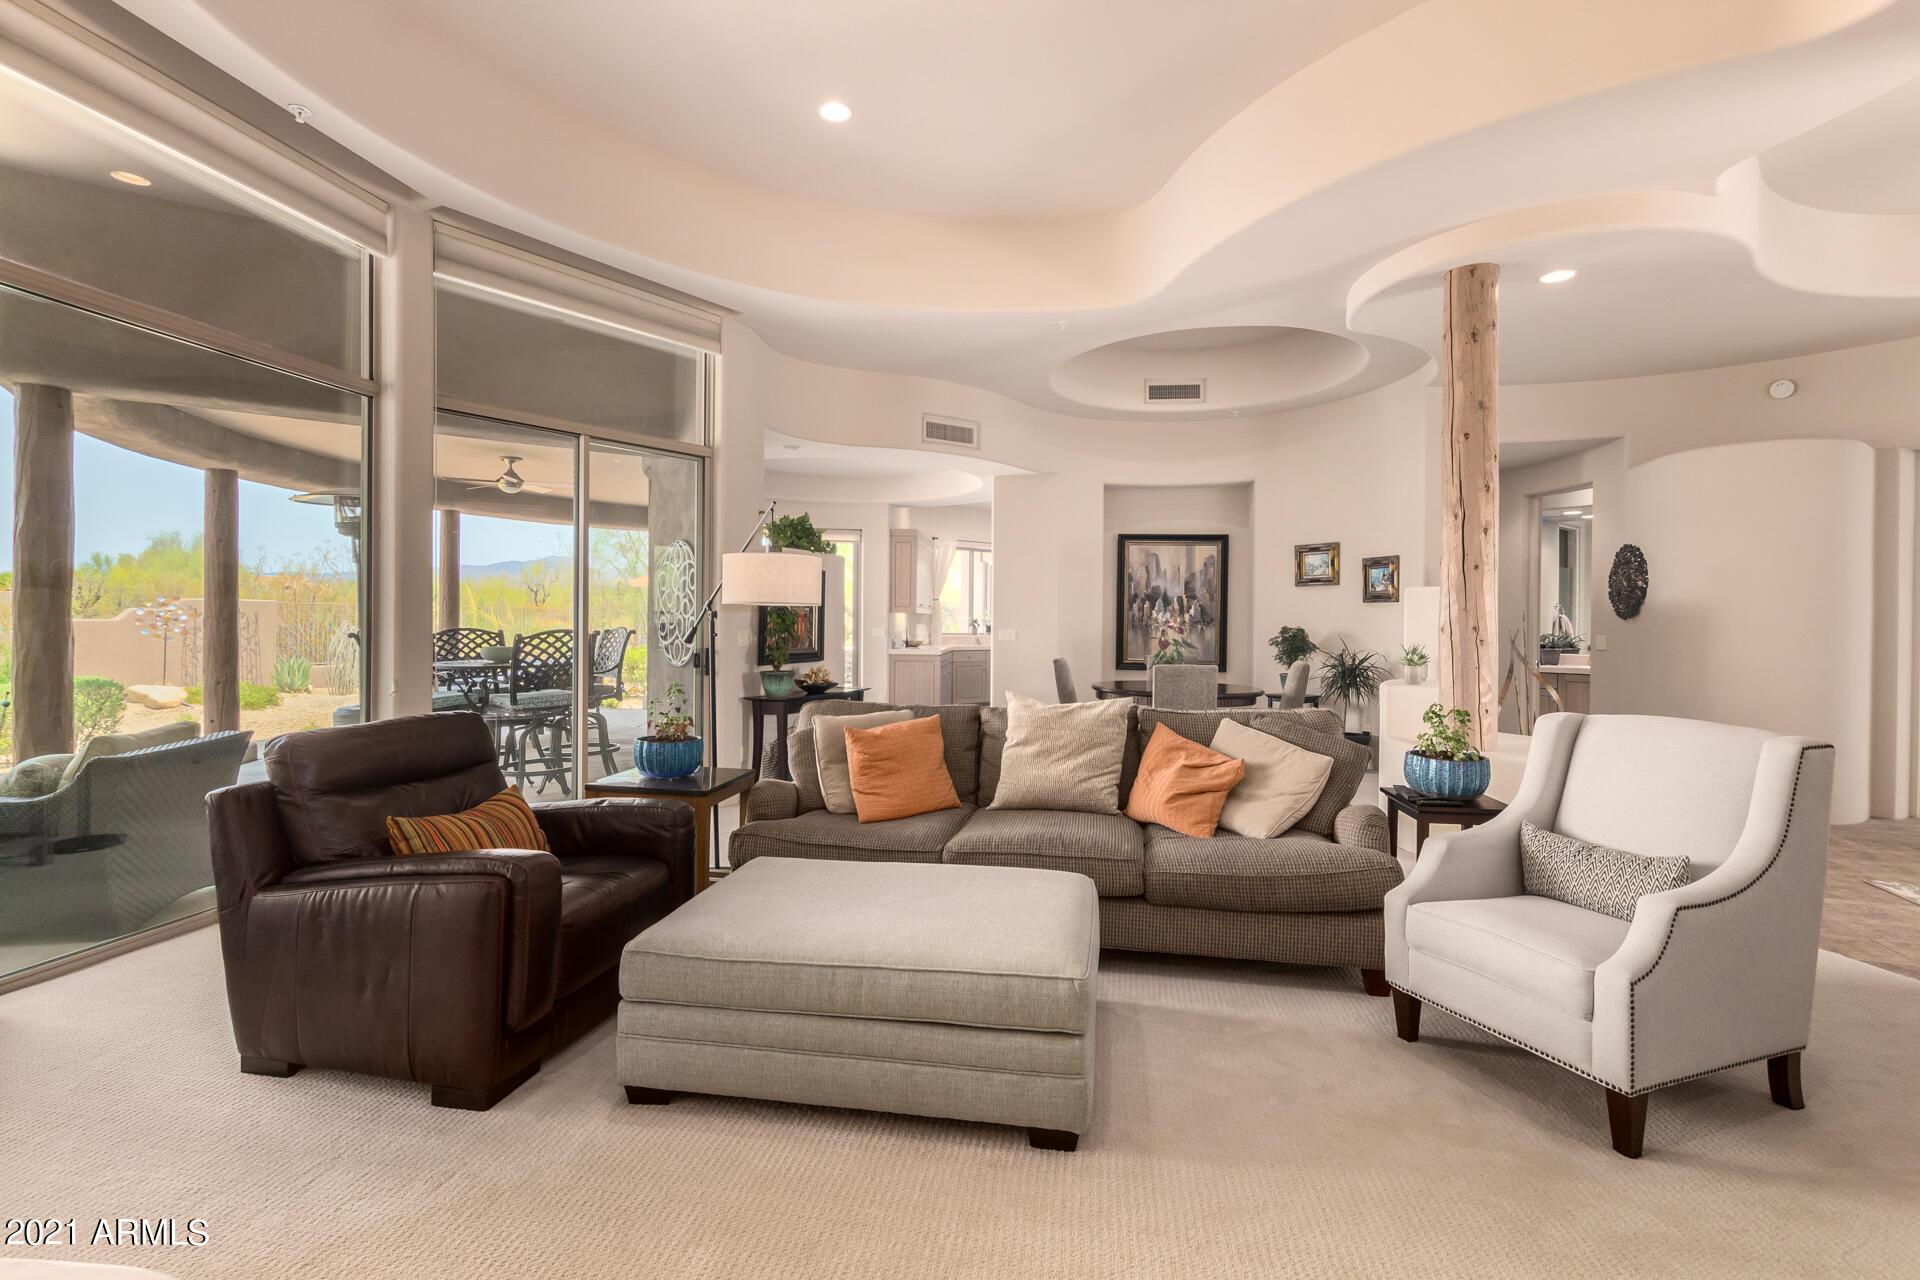 7872 E Thorntree Drive, Scottsdale, AZ 85266, 3 Bedrooms Bedrooms, ,Residential Lease,For Rent,7872 E Thorntree Drive,6274664